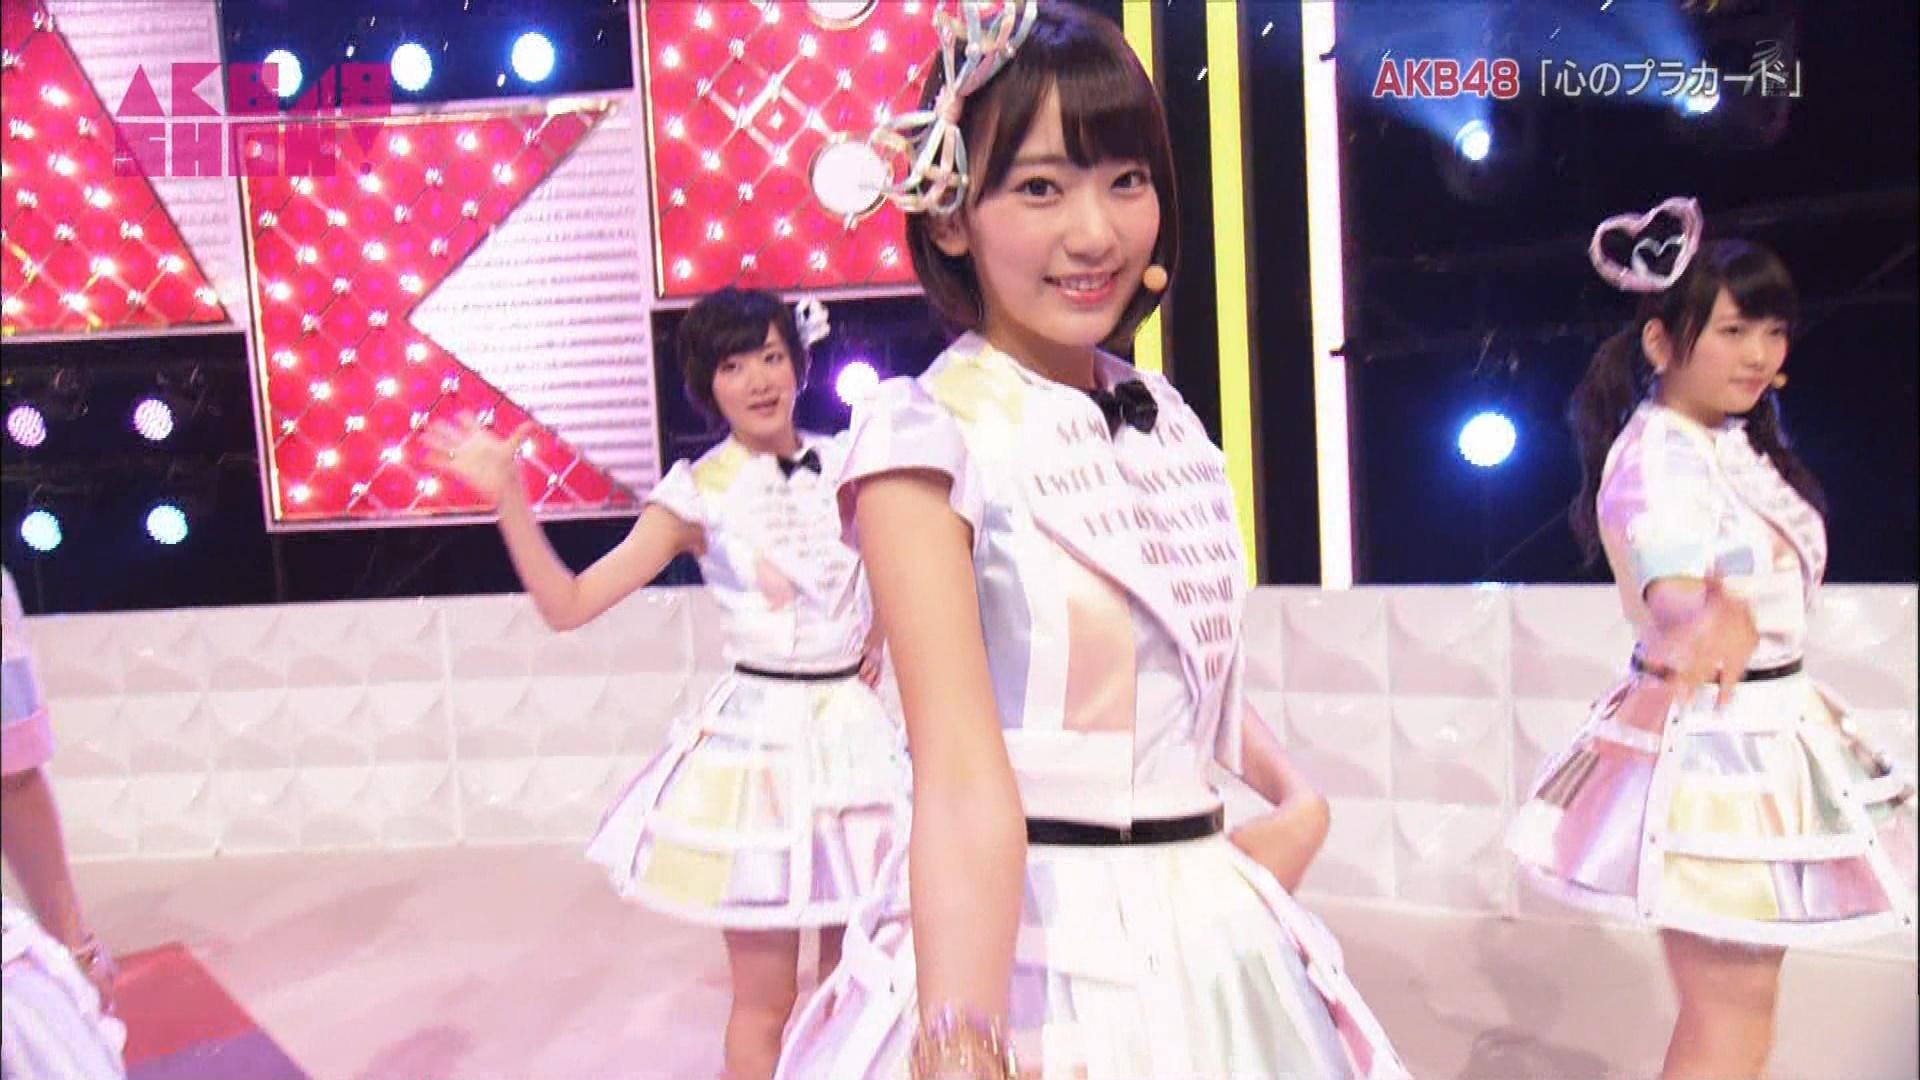 AKB48SHOW 心のプラカード 宮脇咲良 20140830 (18)